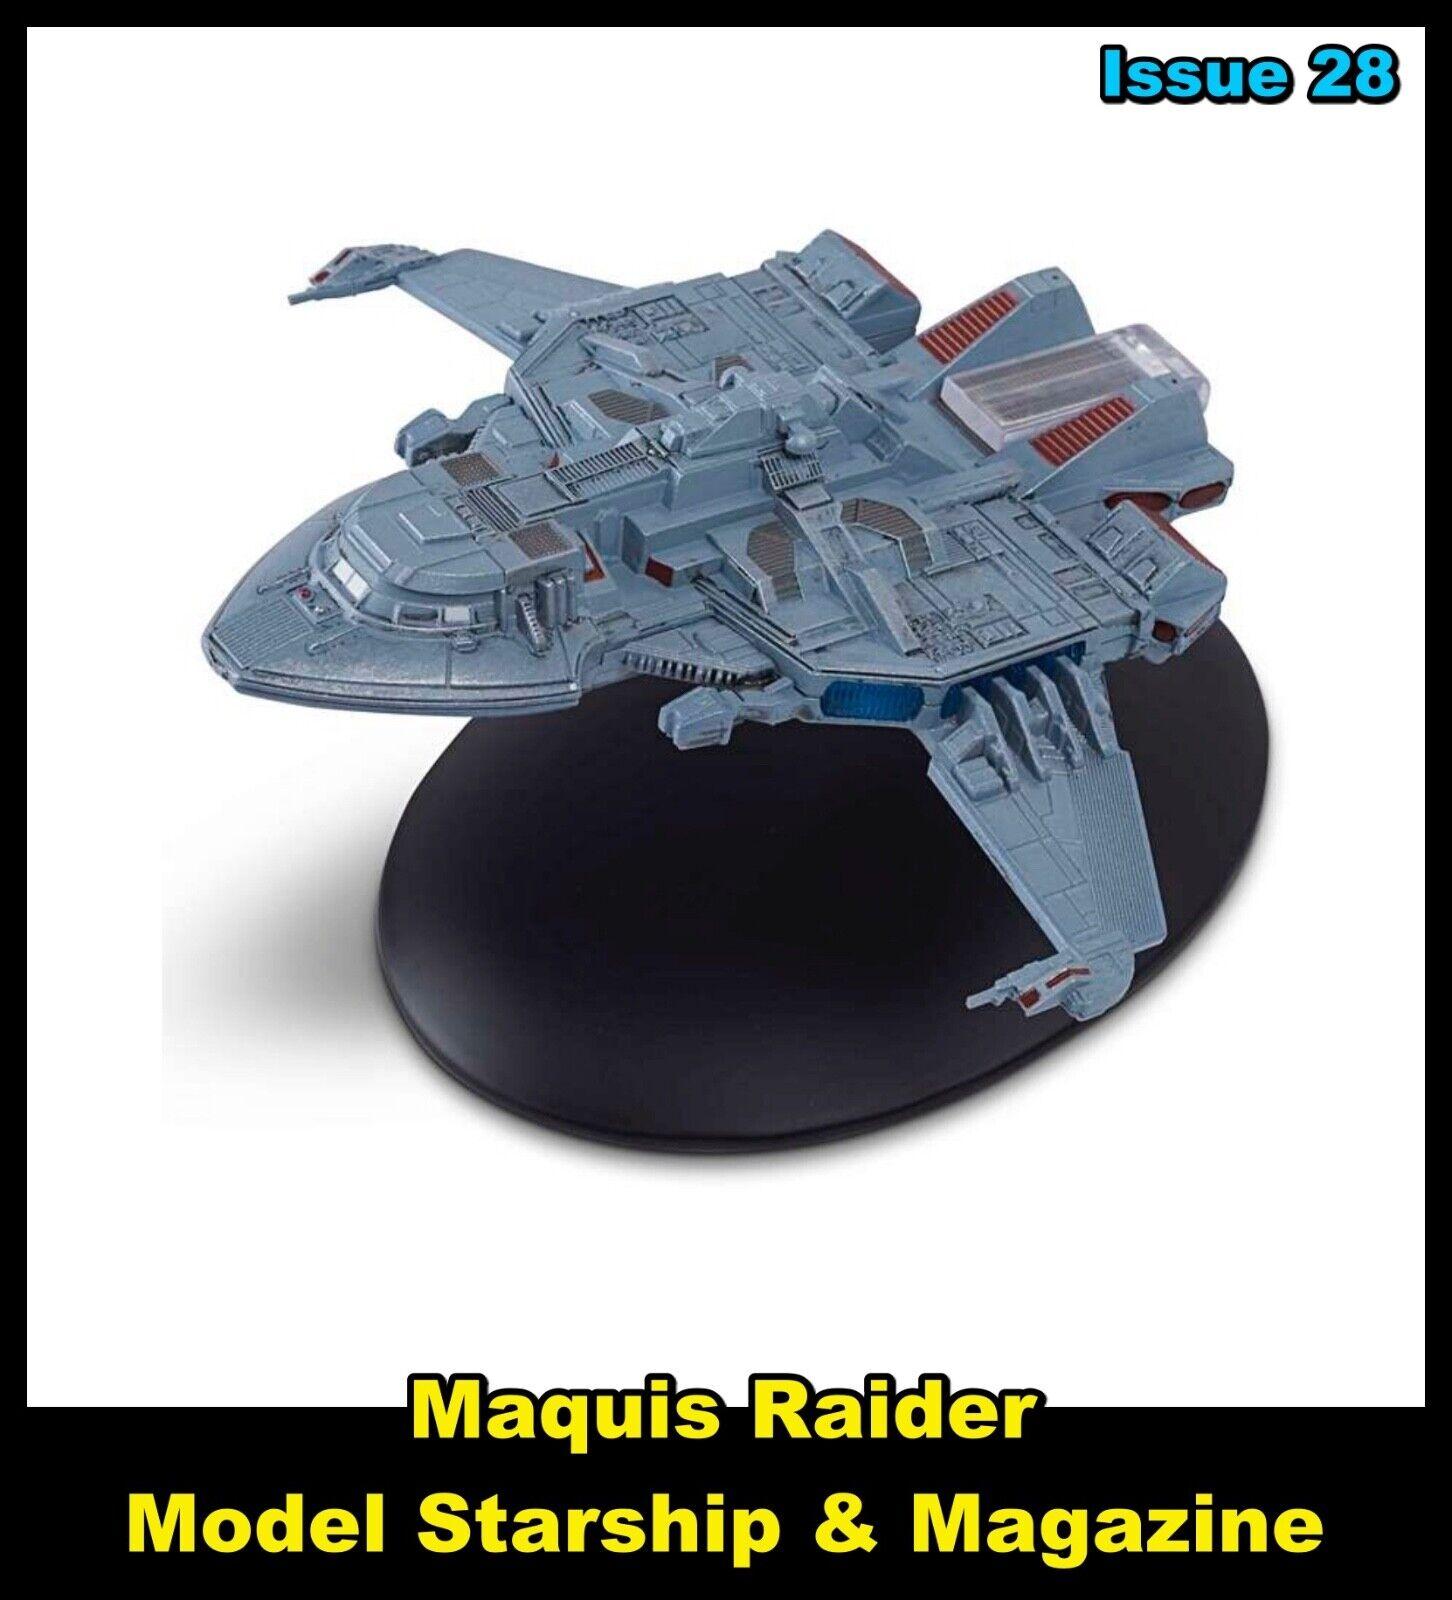 Issue 28: Maquis Raider Starship Model